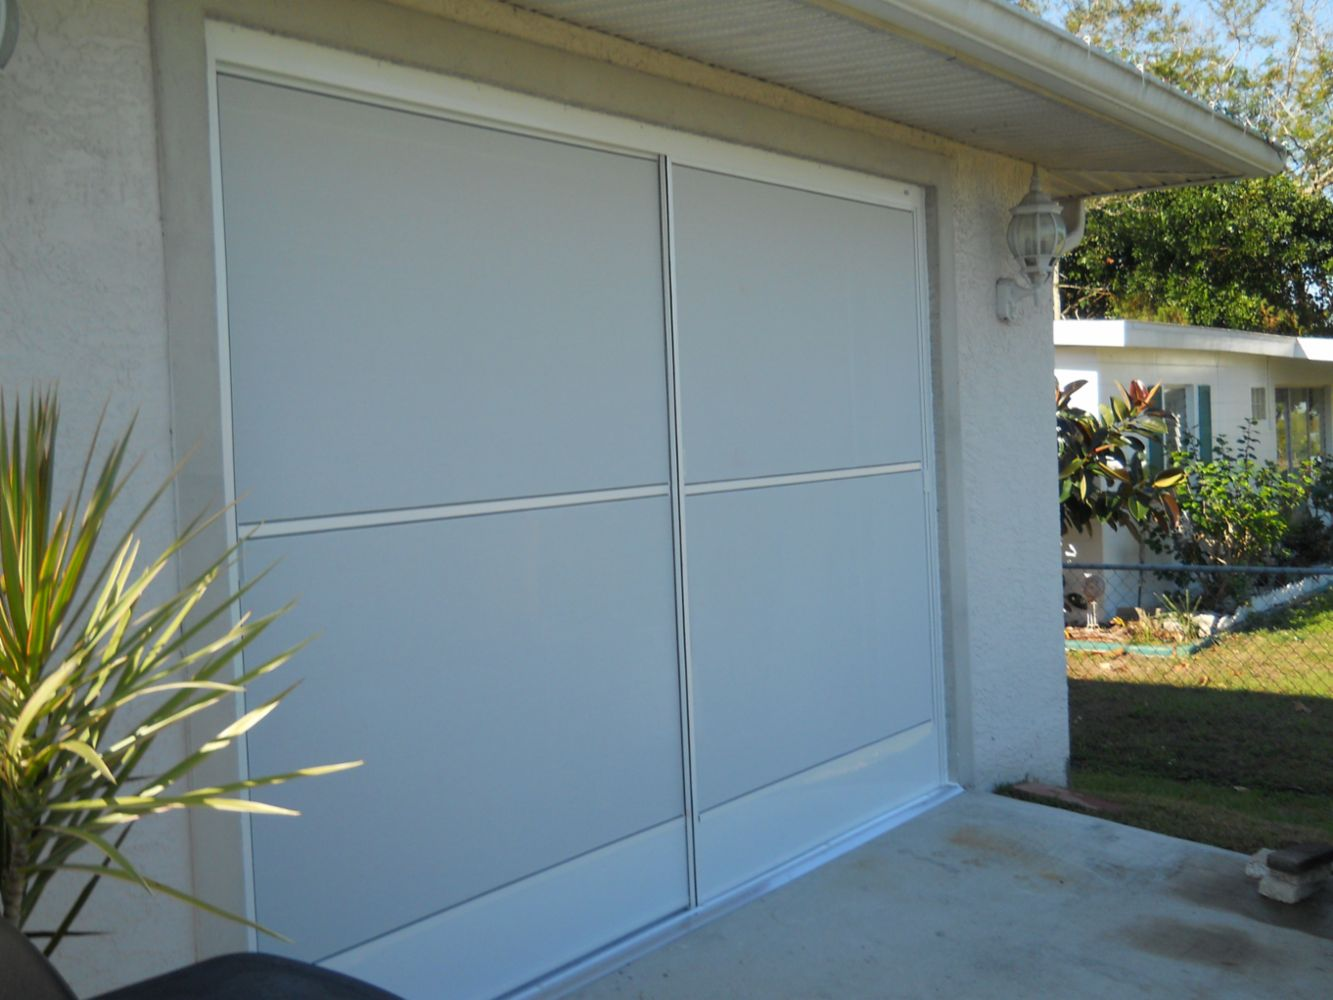 Garage Sliding Screens/ Vinyl Window Reroll in Port Charlotte, FL ...